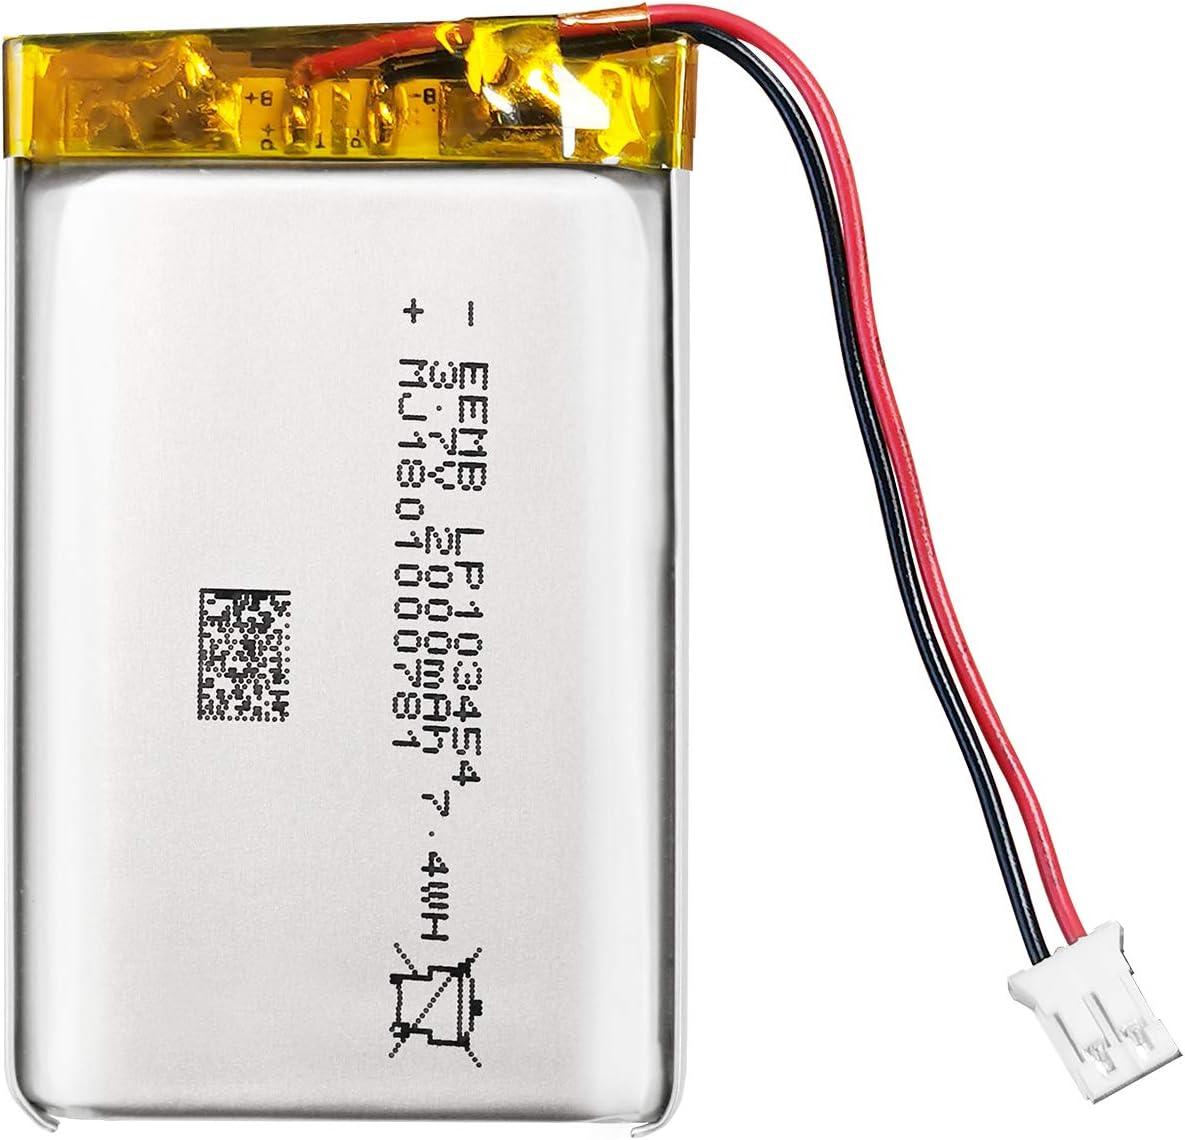 EEMB New product!! 3.7V National uniform free shipping Lithium ion Polymer Battery Batter 103454 2000mAh Lipo